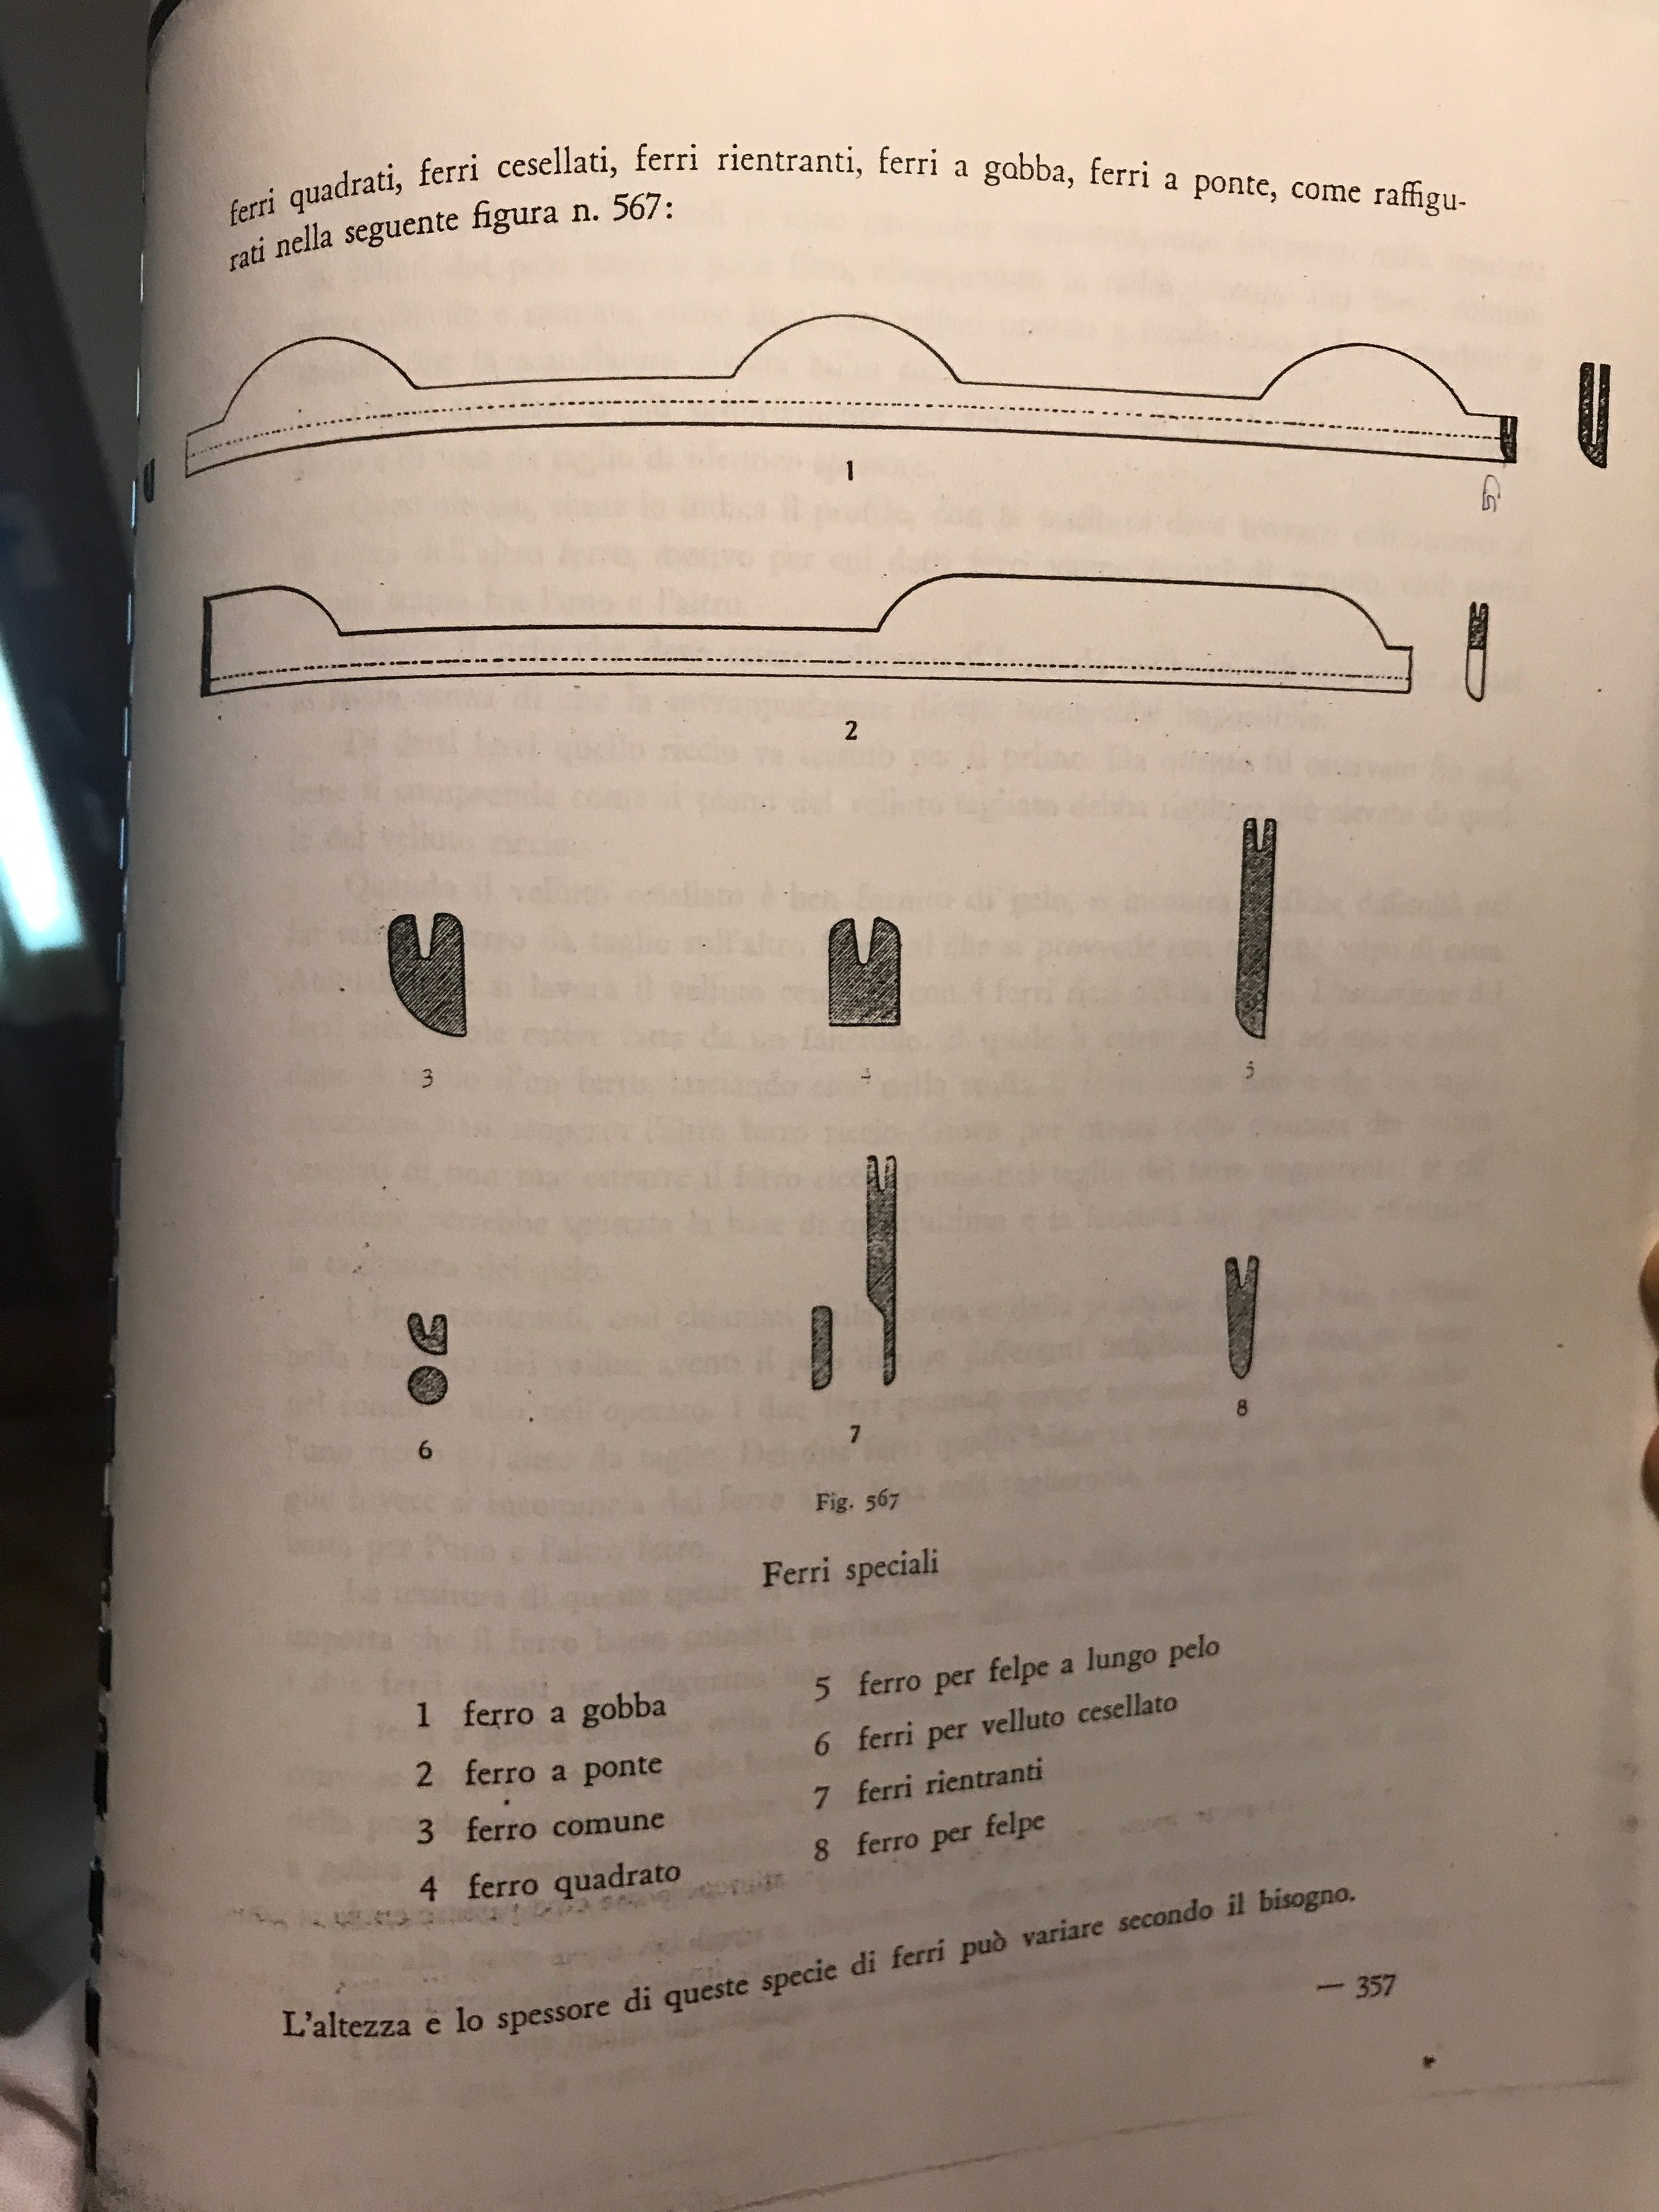 Illustrations of historical velvet weaving rods and techniques.